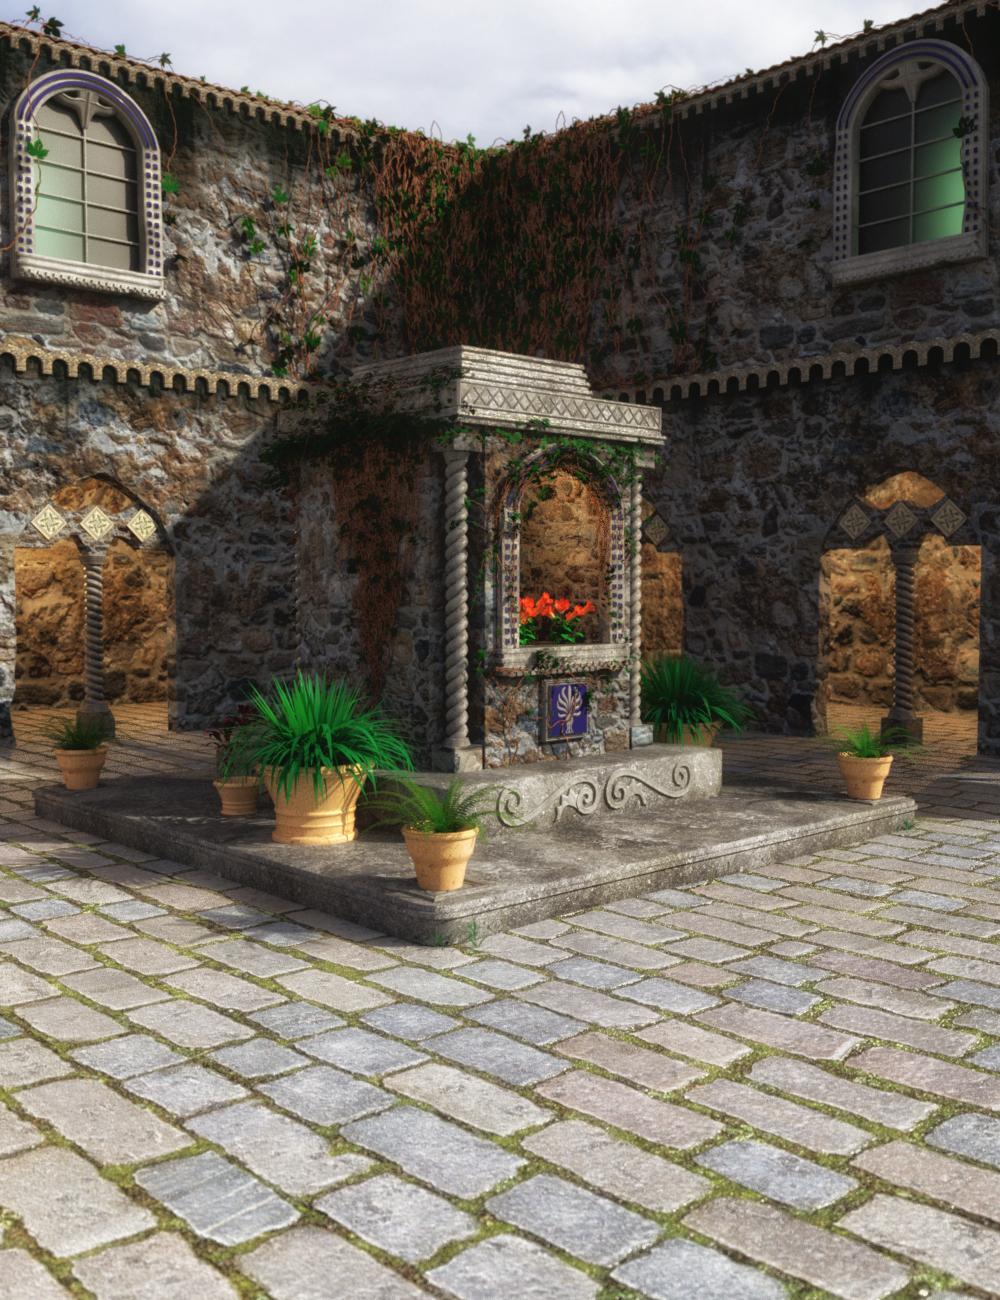 Villa Cimone Courtyard by: ImagineX, 3D Models by Daz 3D